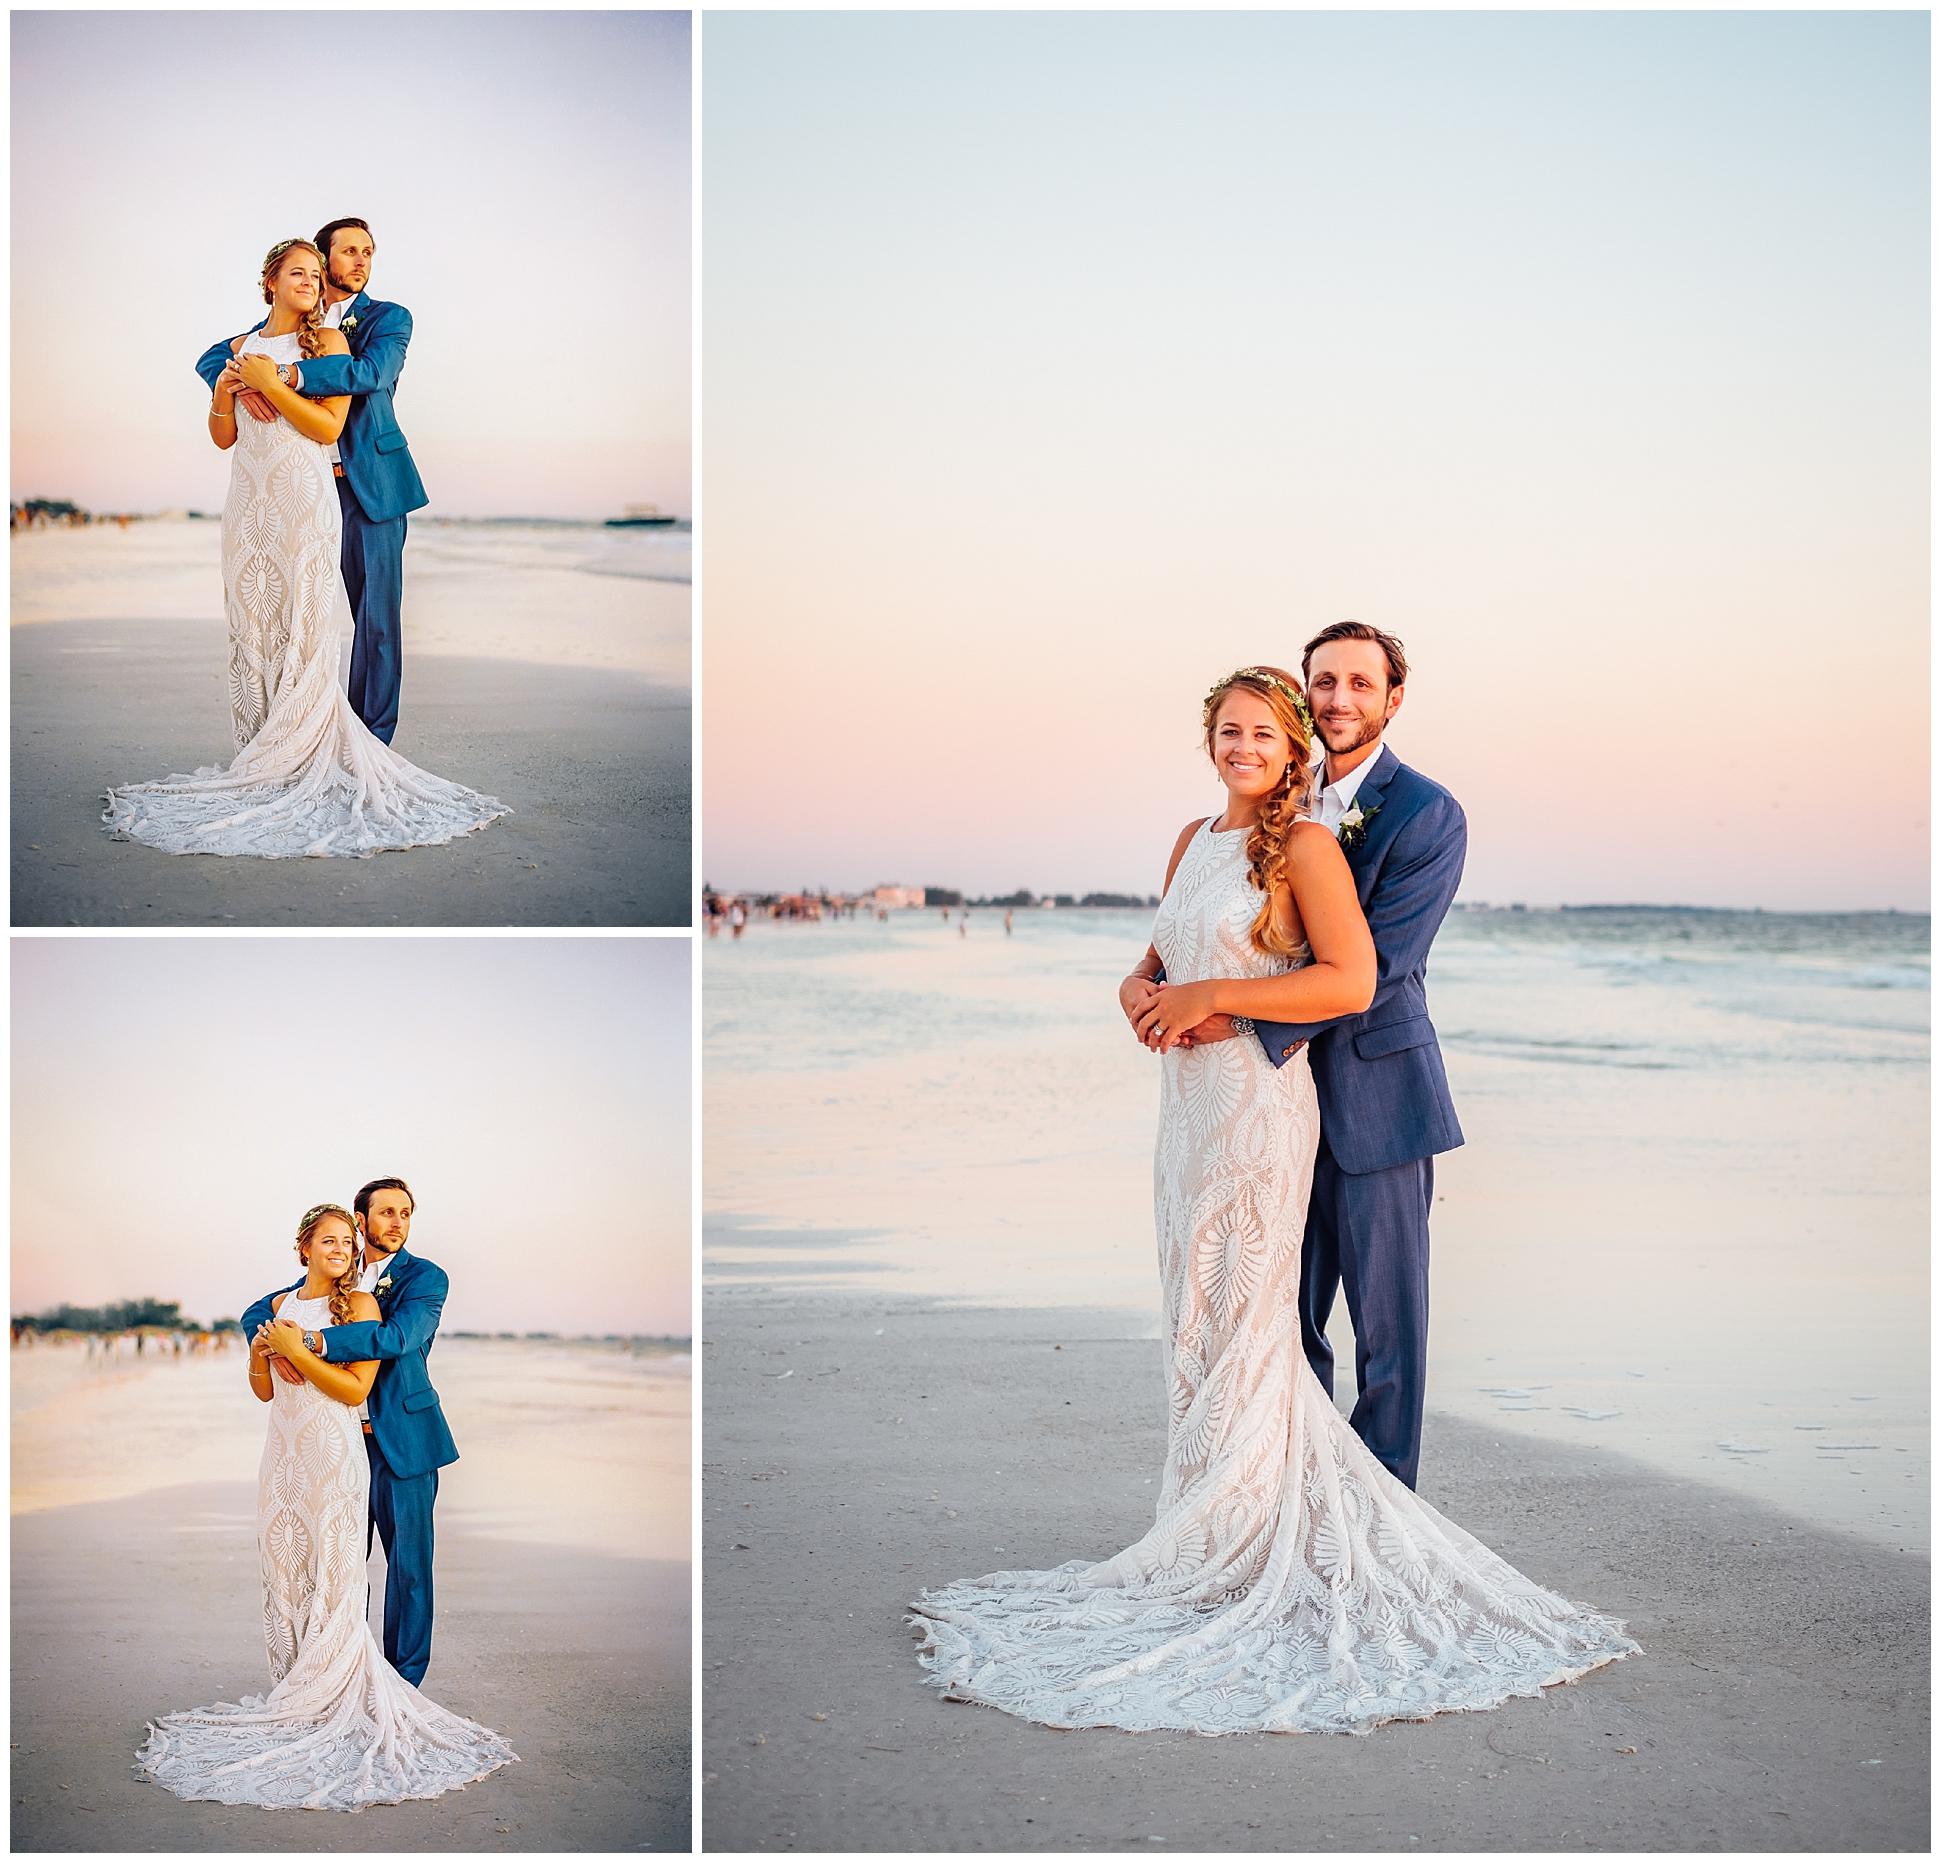 medium-format-film-vs-digital-wedding-photography-florida-beach_0024.jpg